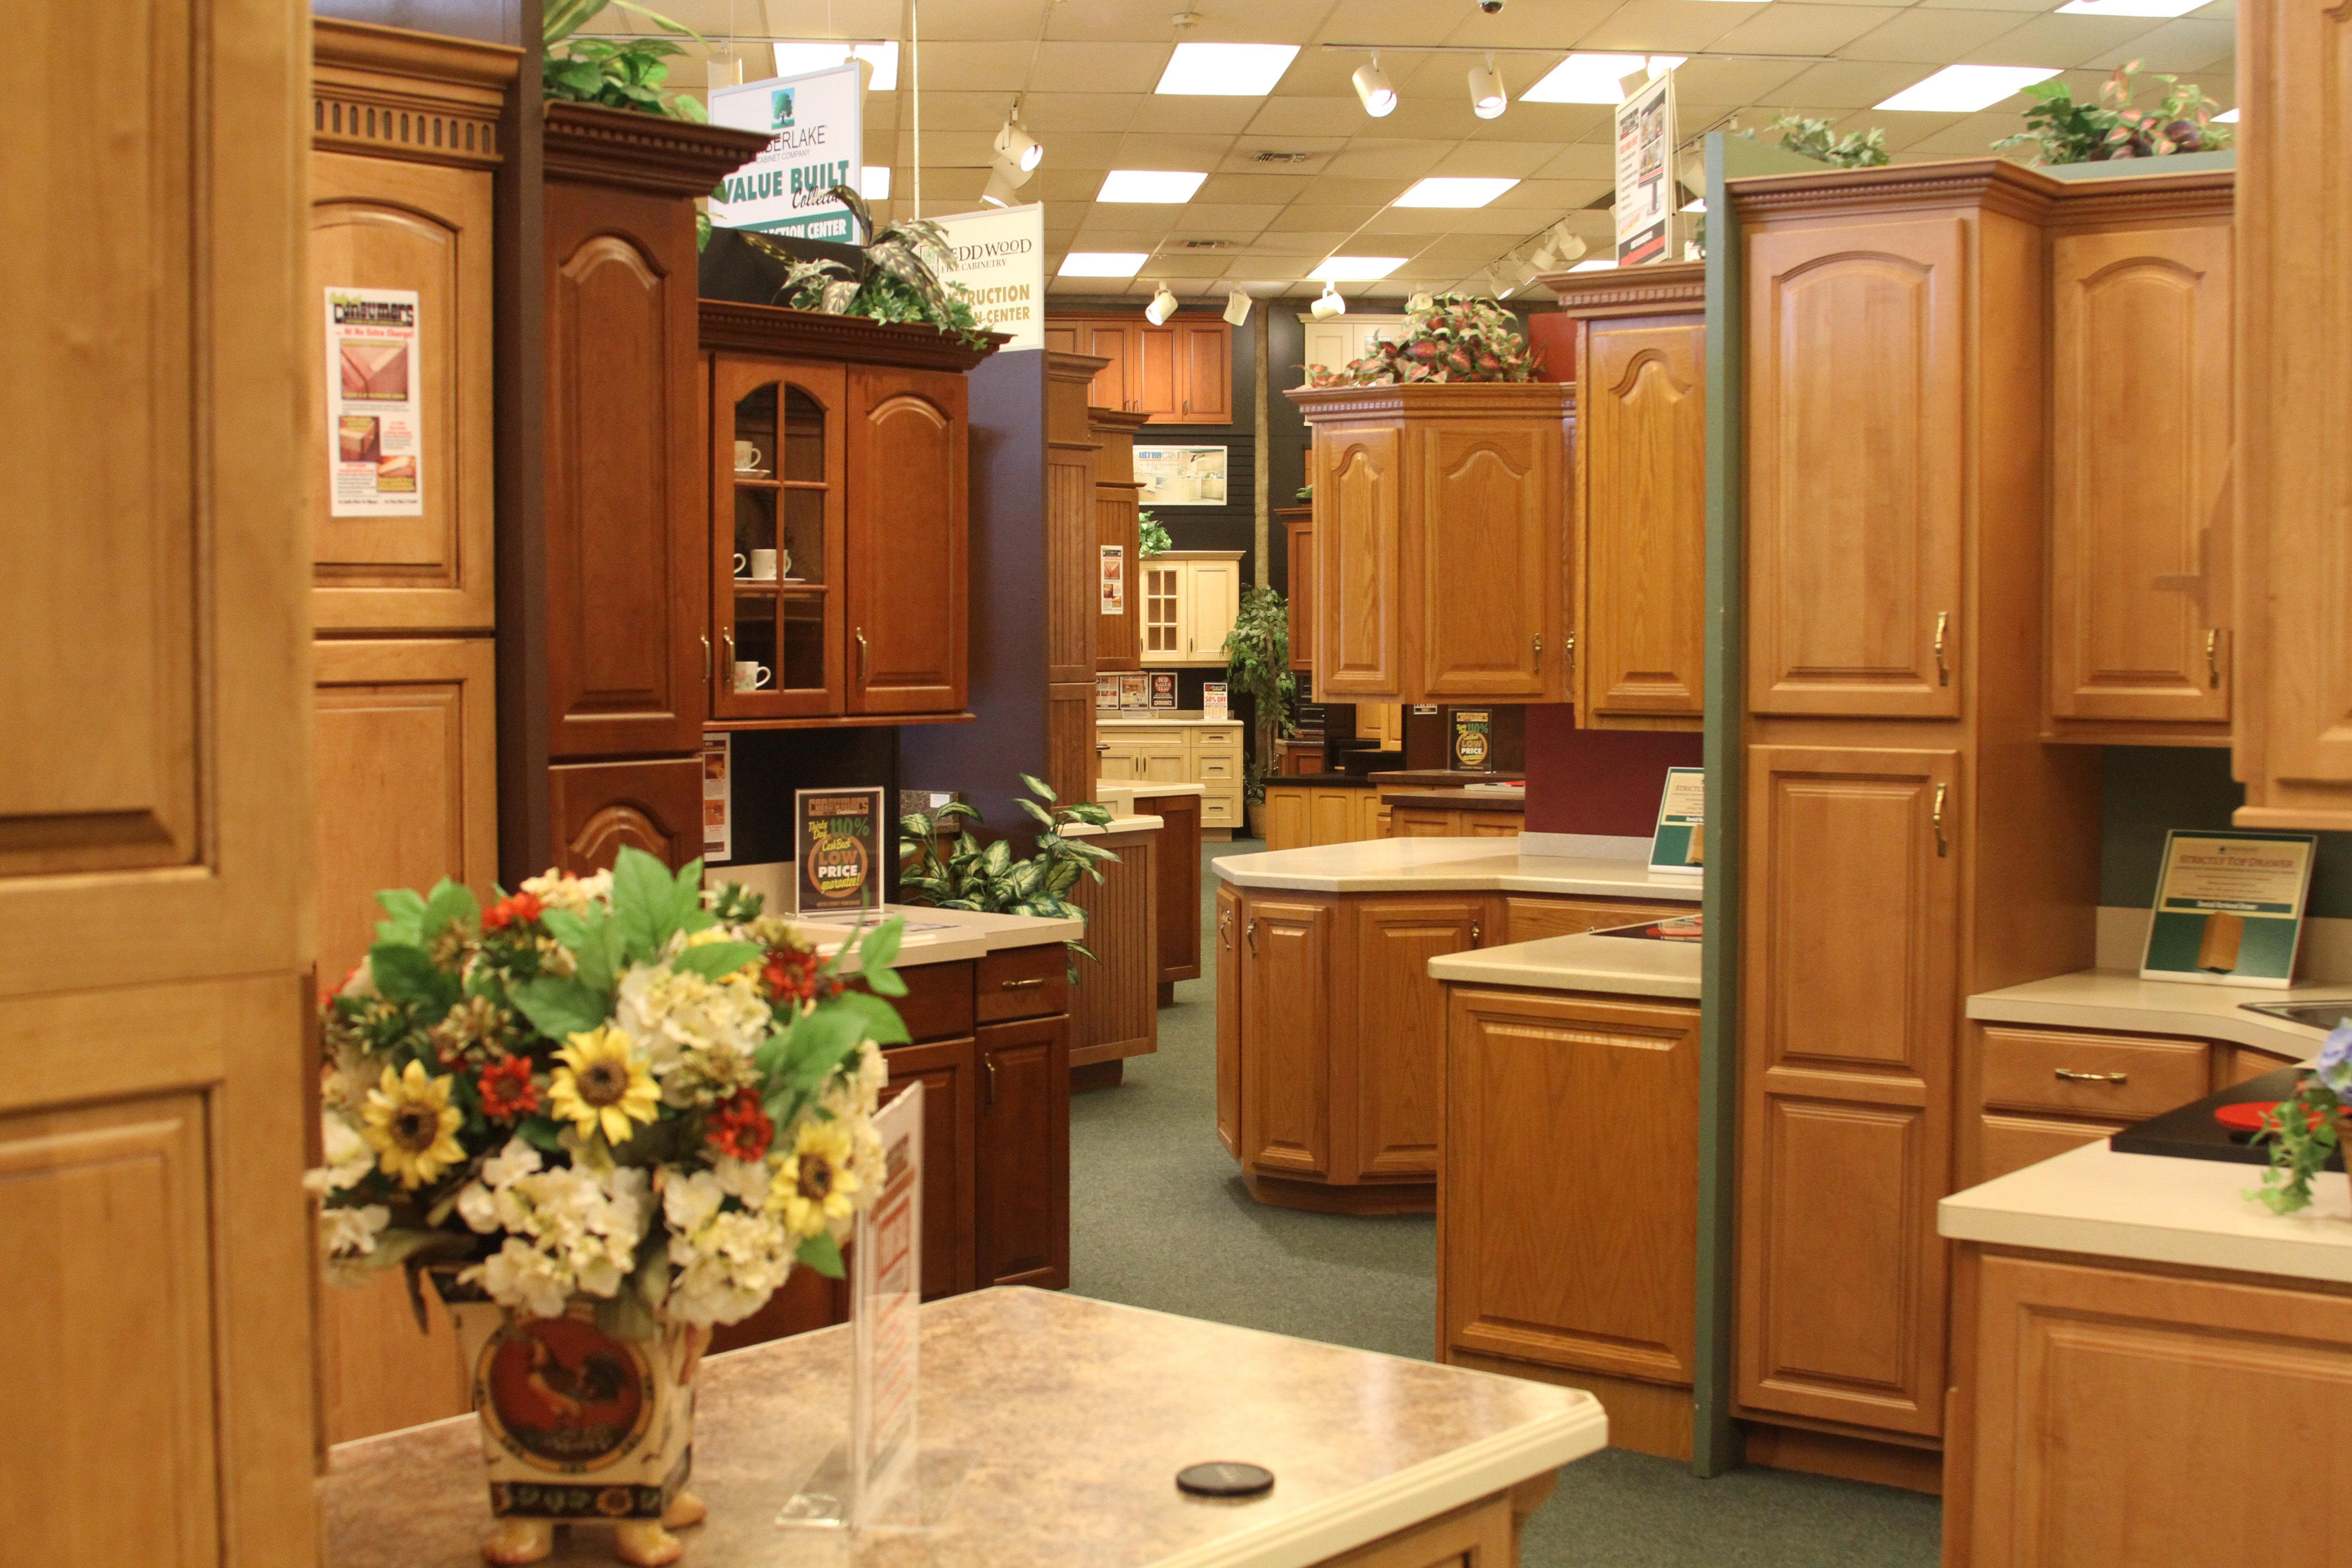 Consumer Kitchen & Baths 717 Broadway Ave, Holbrook, NY 11741 - YP.com